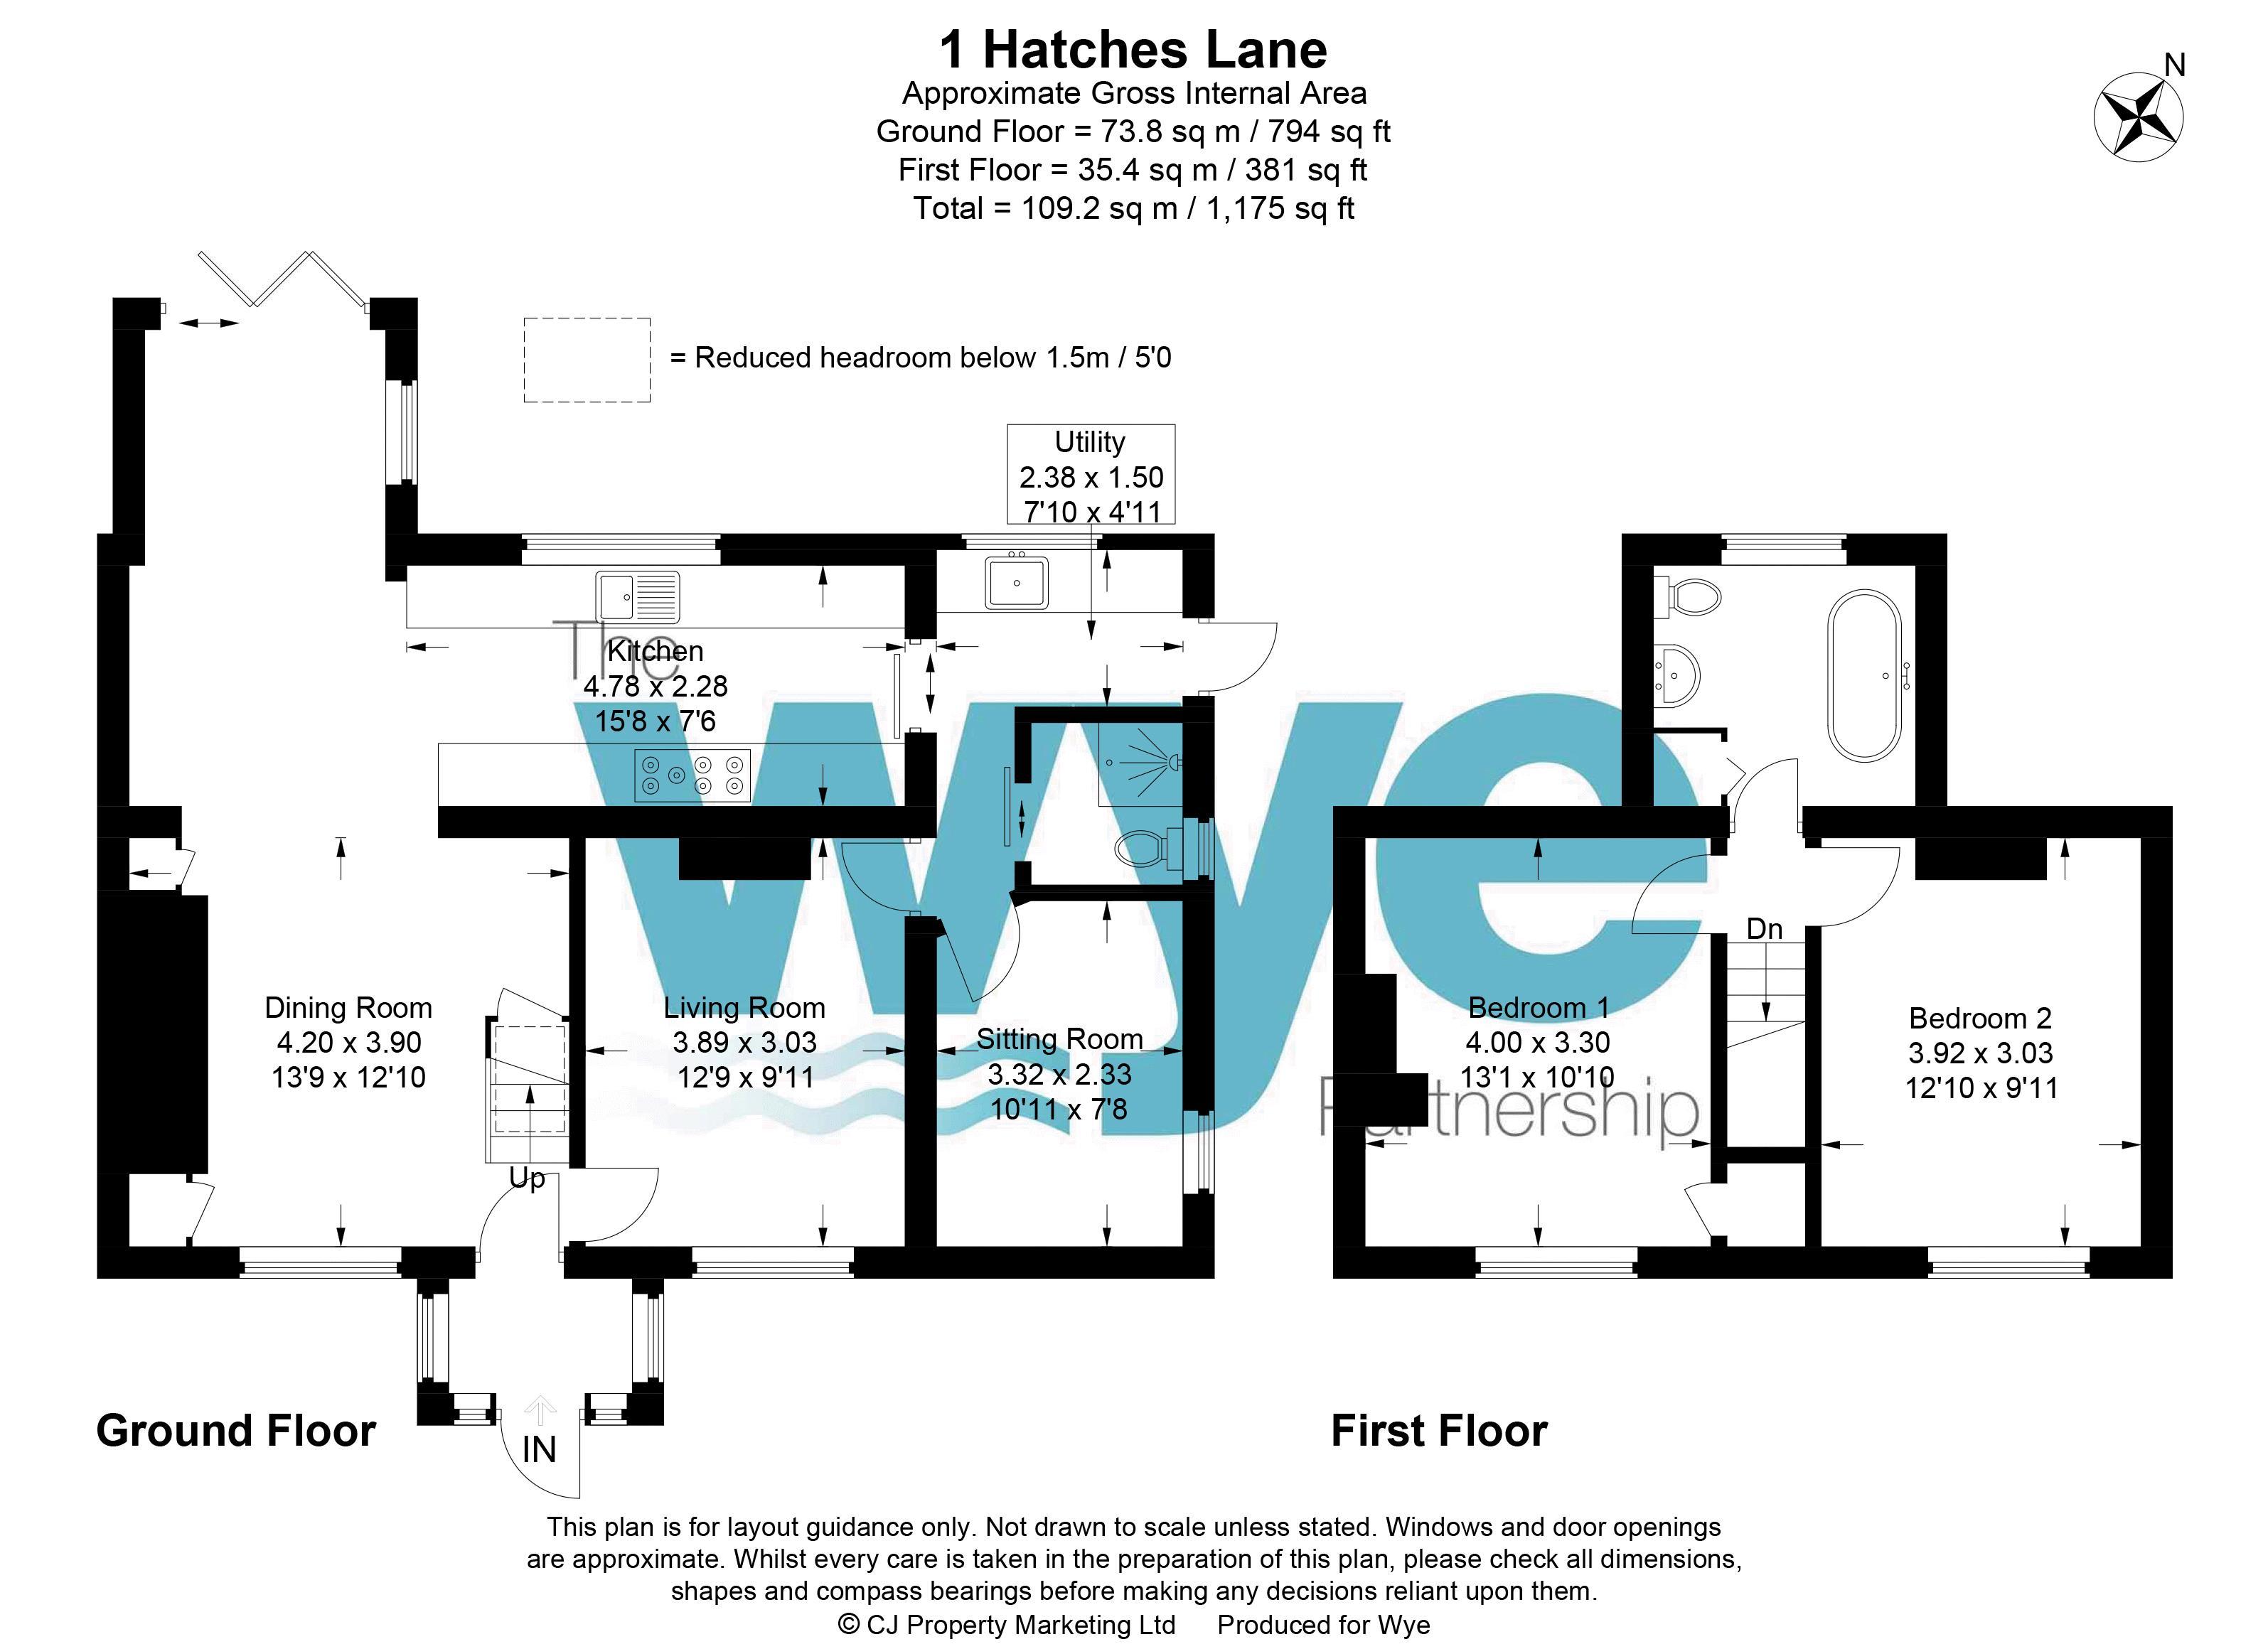 Hatches Lane